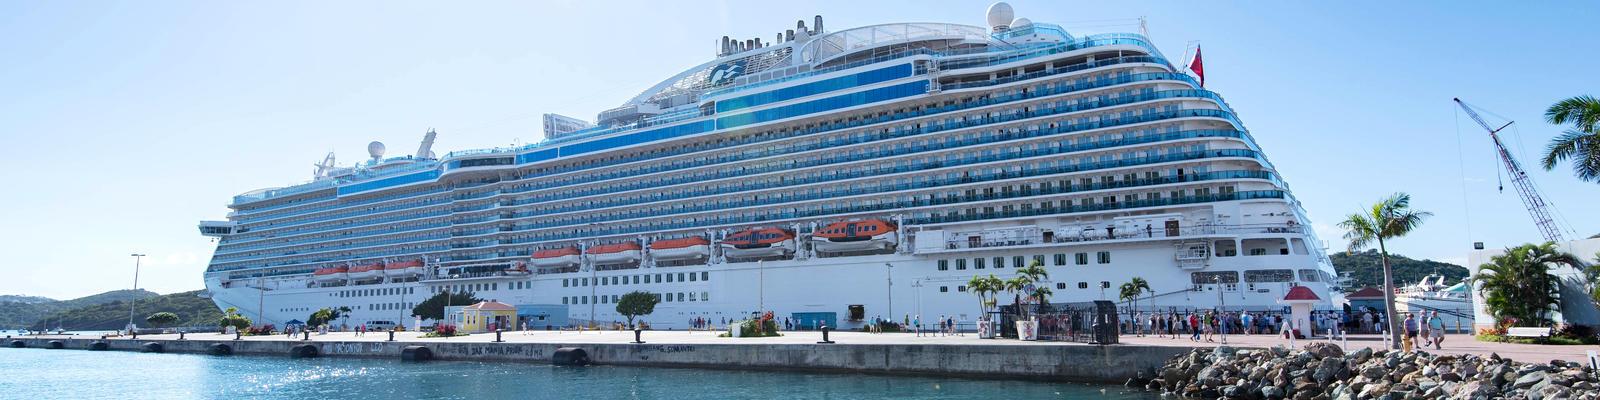 Royal Princess (Photo: Cruise Critic)